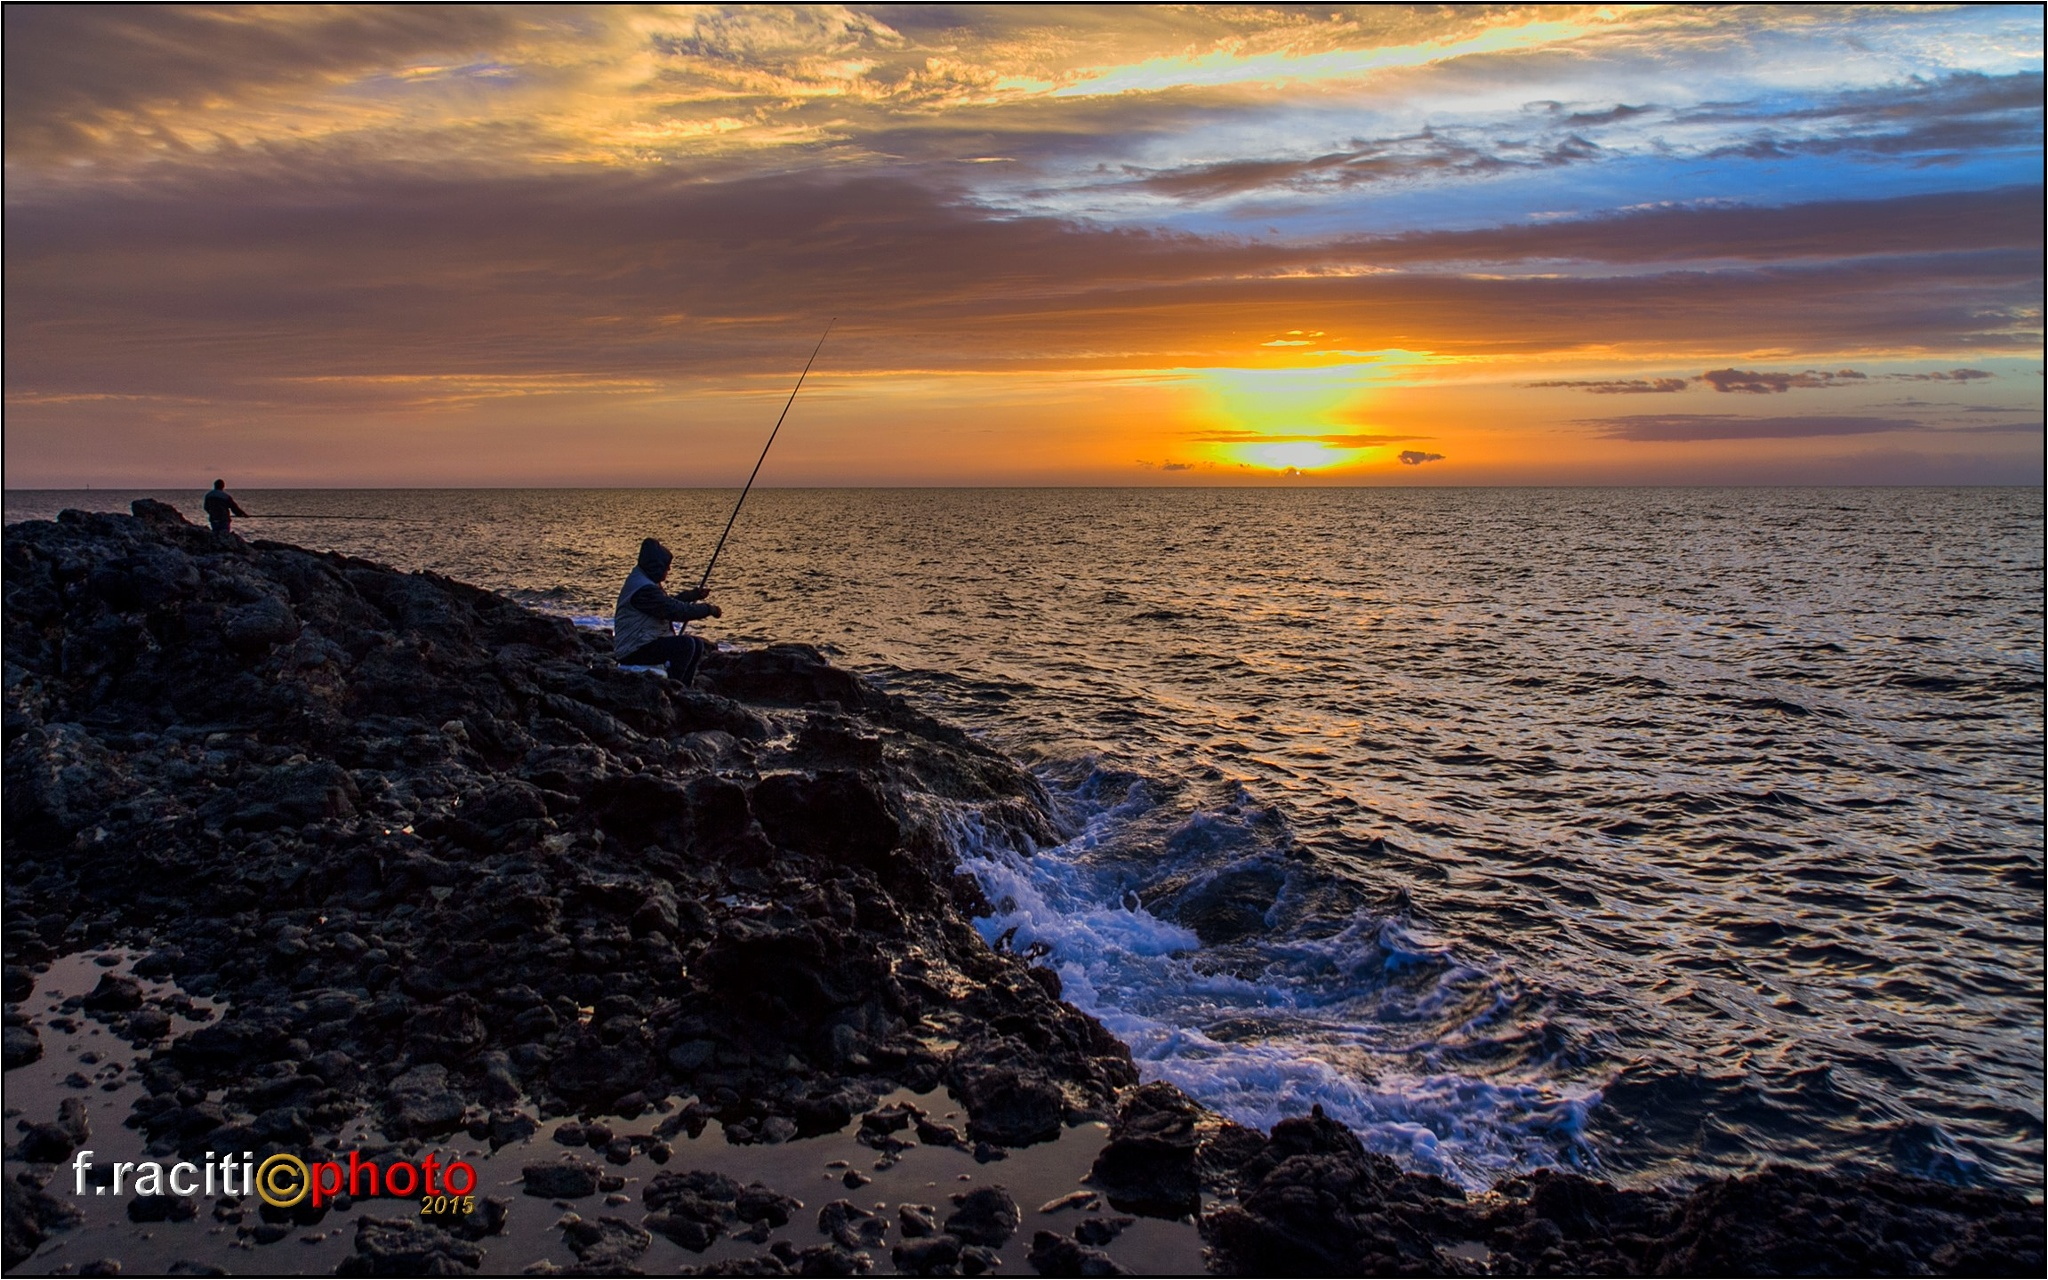 Fisherman by Francesco Raciti